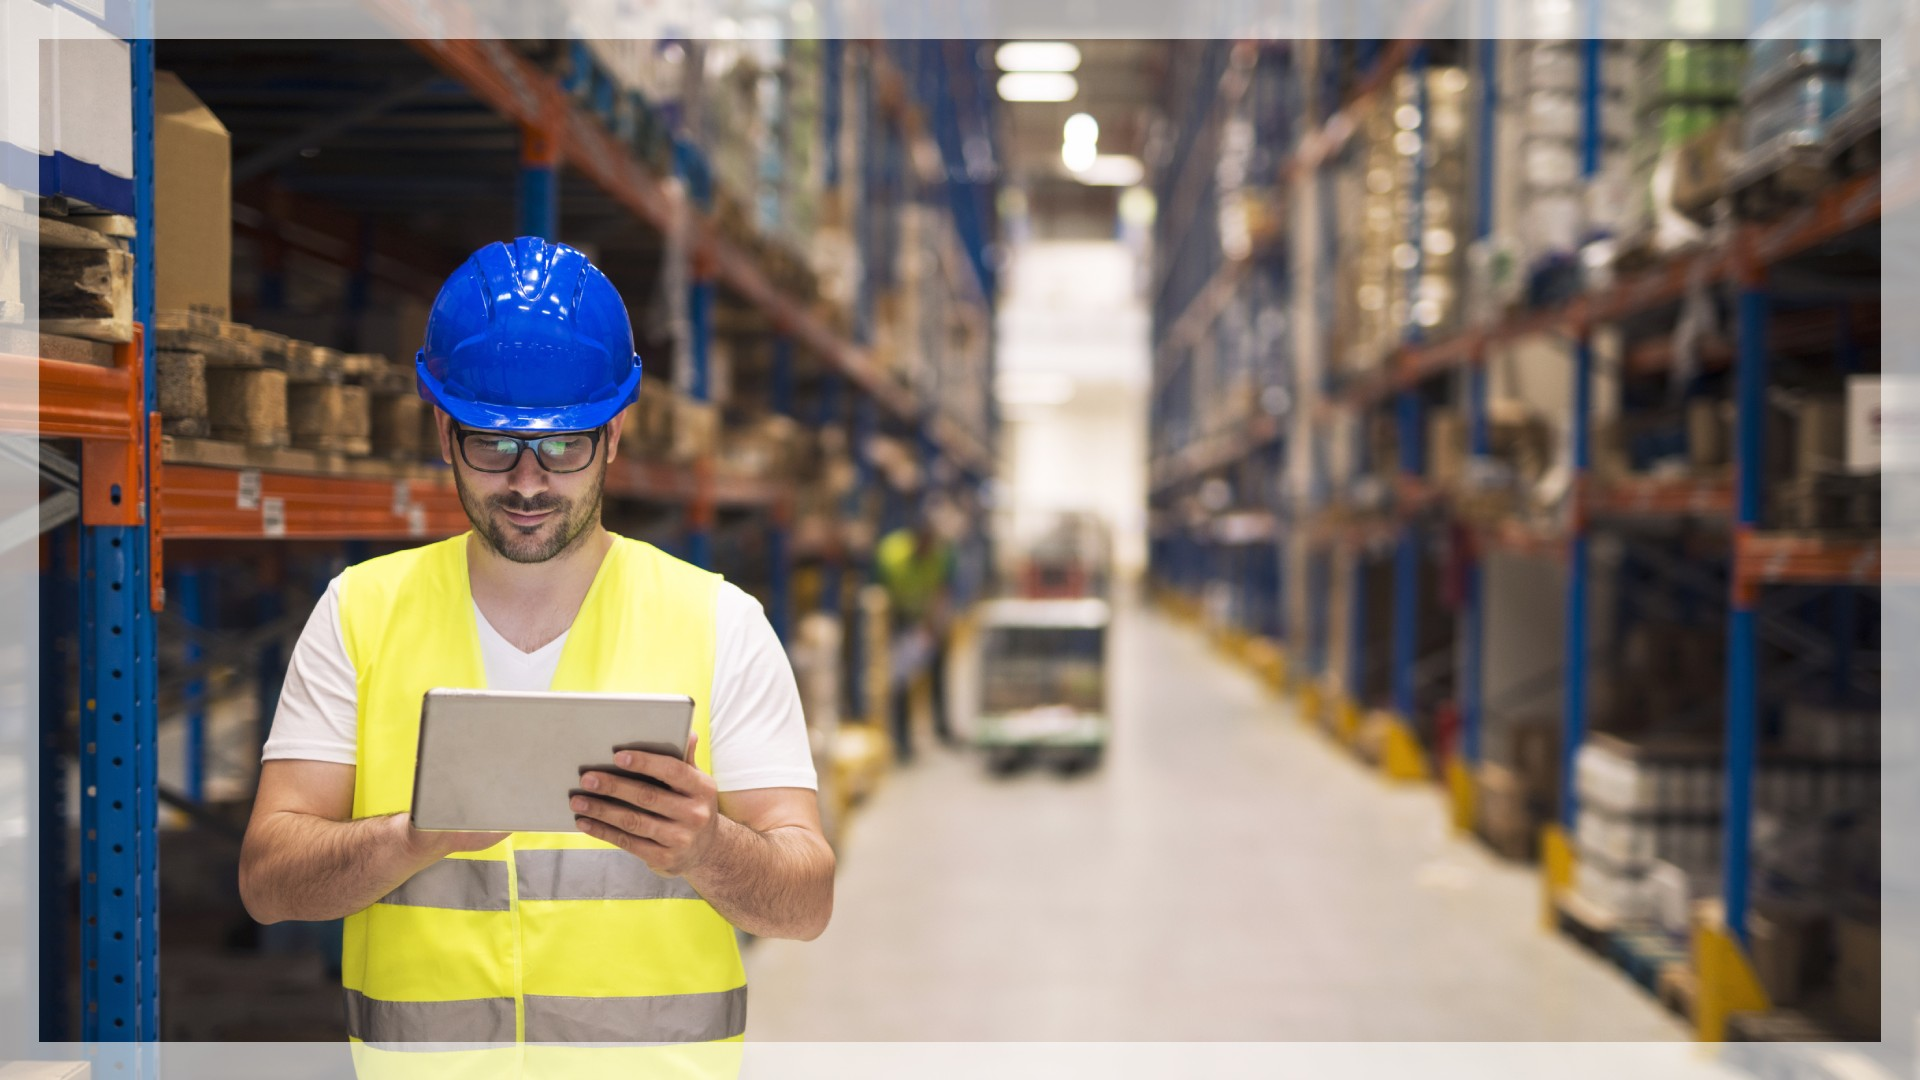 cii-wmp-warehouse-management-professional